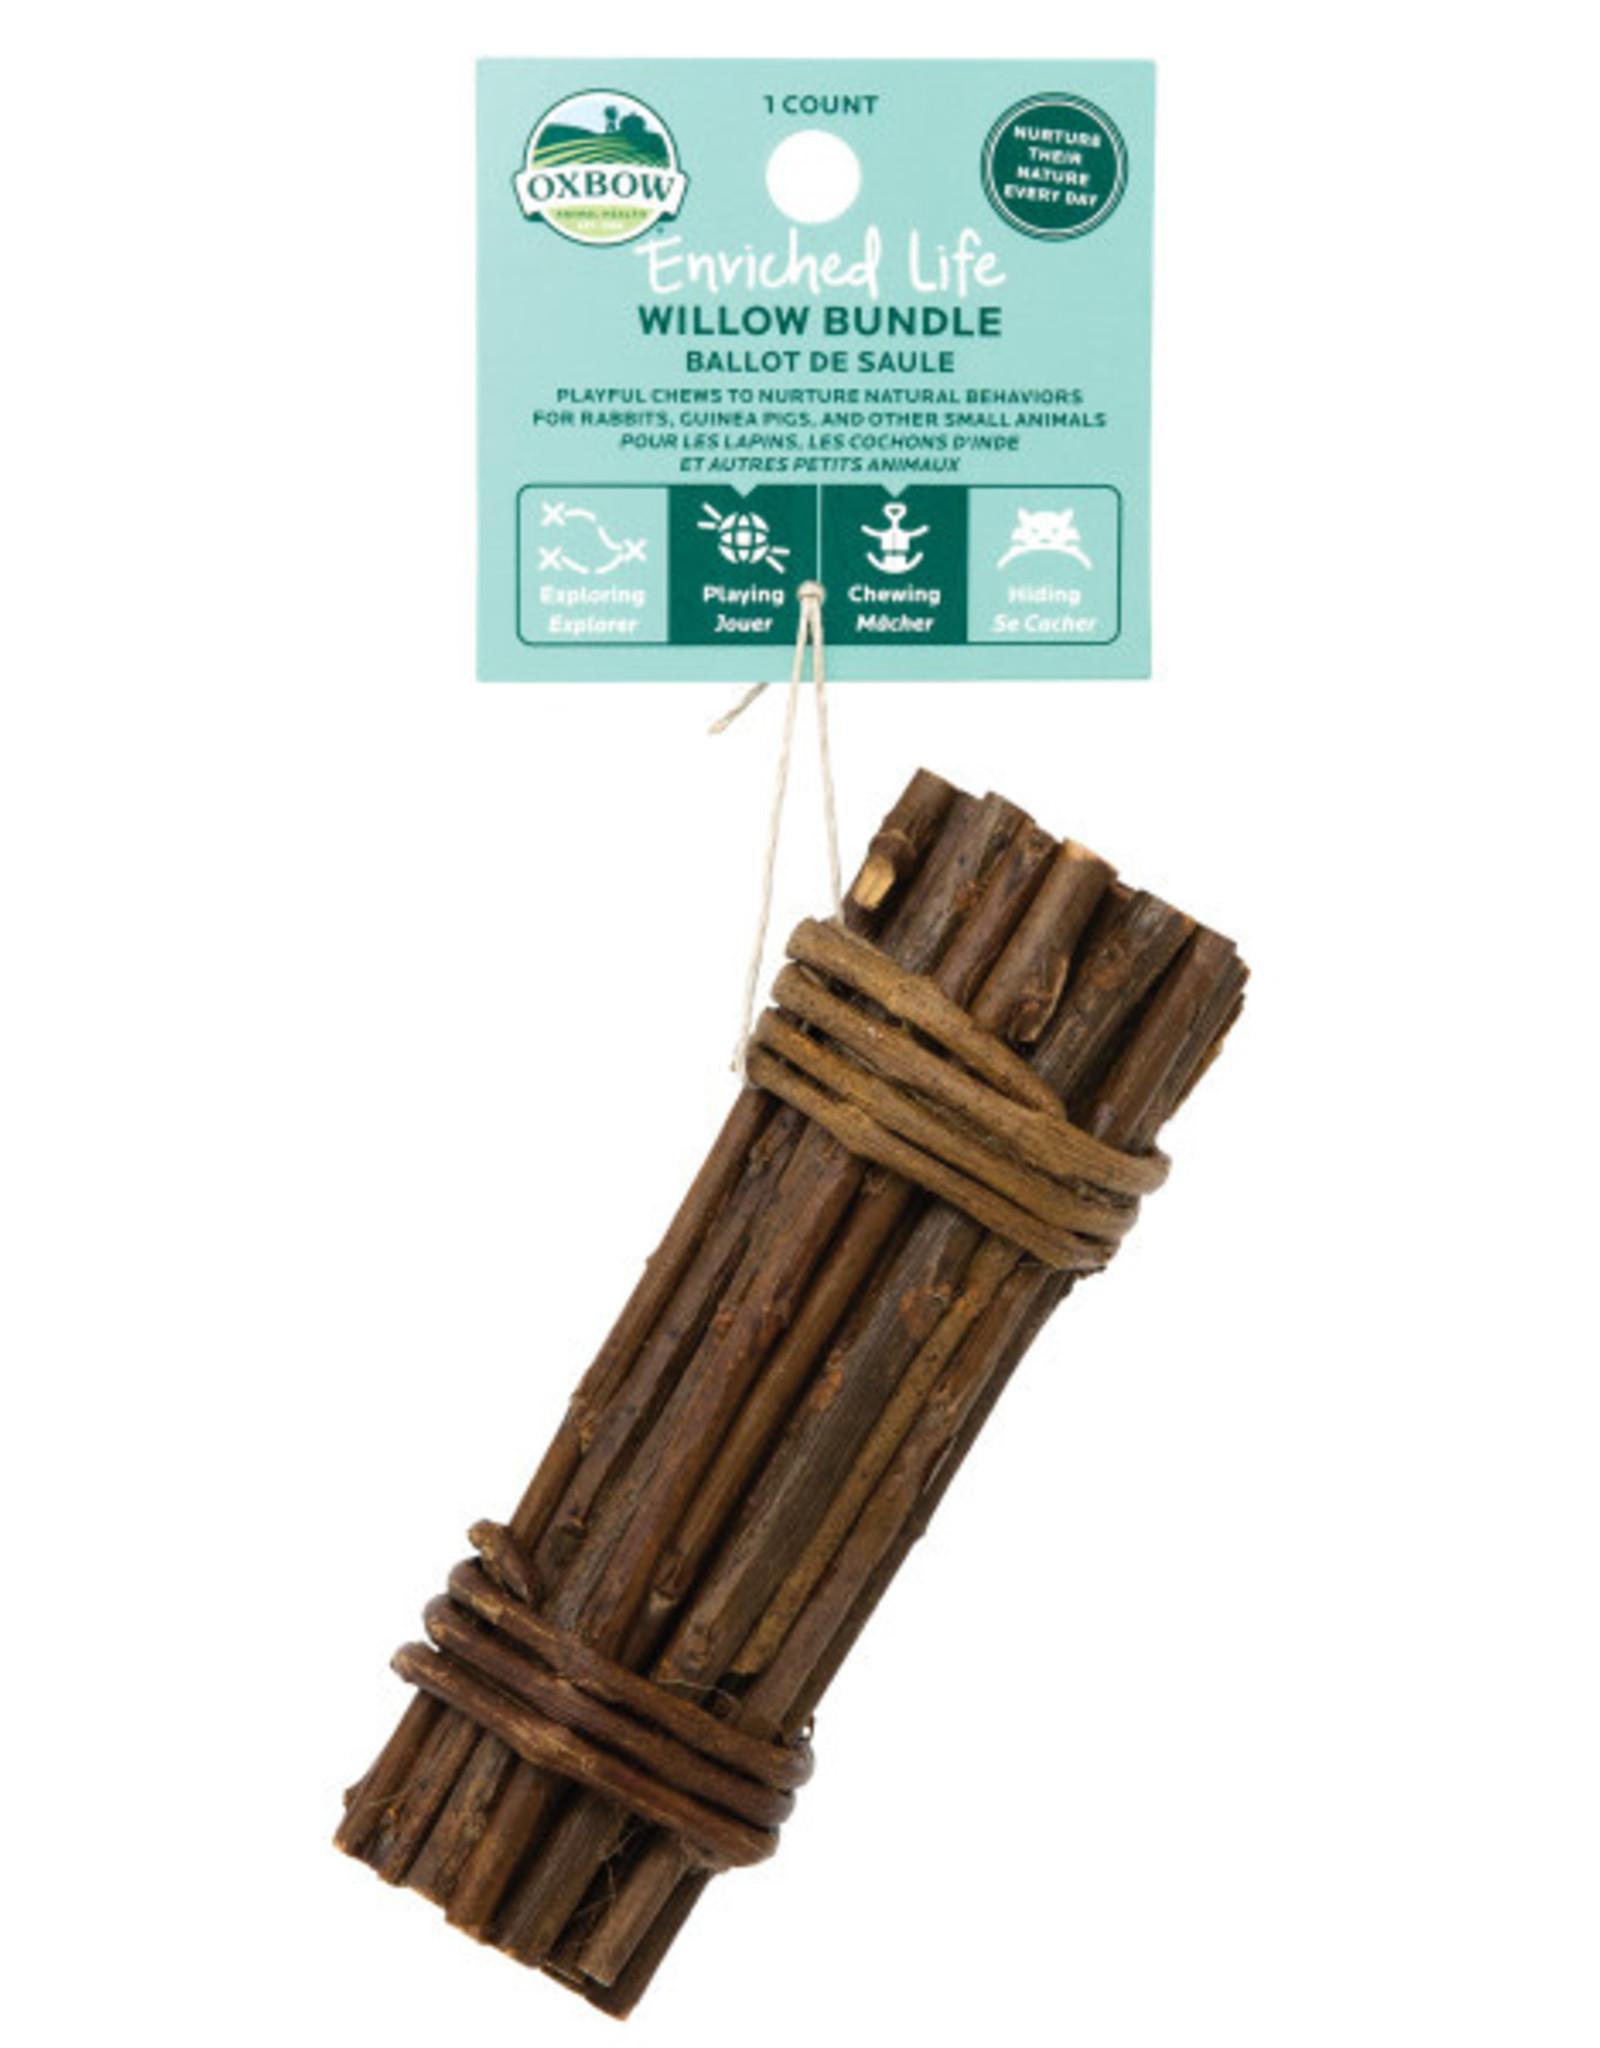 Oxbow Willow Bundle